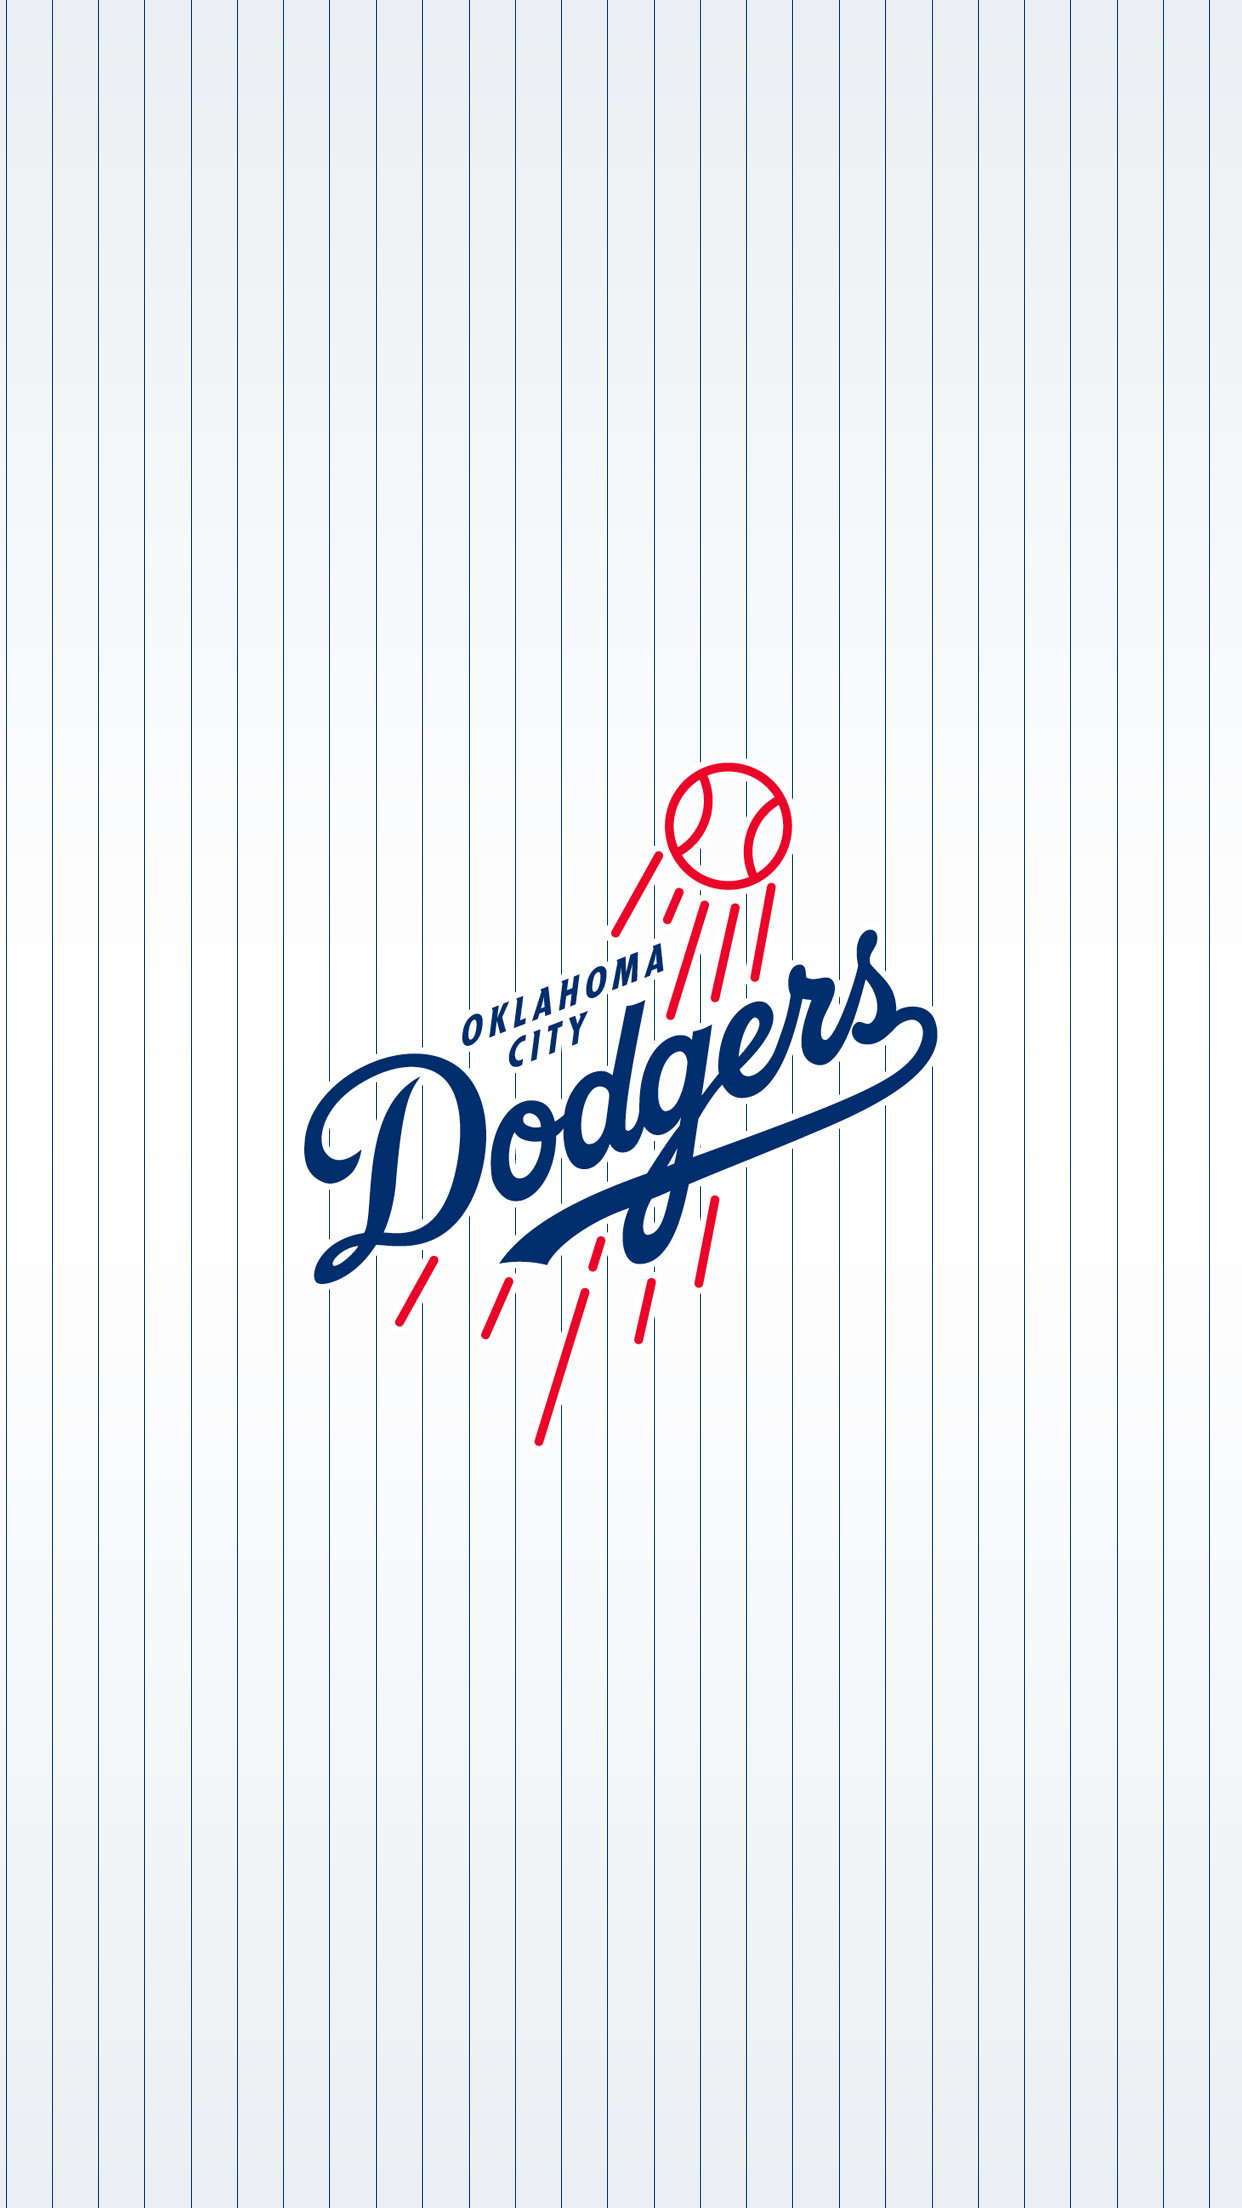 dodgers wallpaper (76+ images)